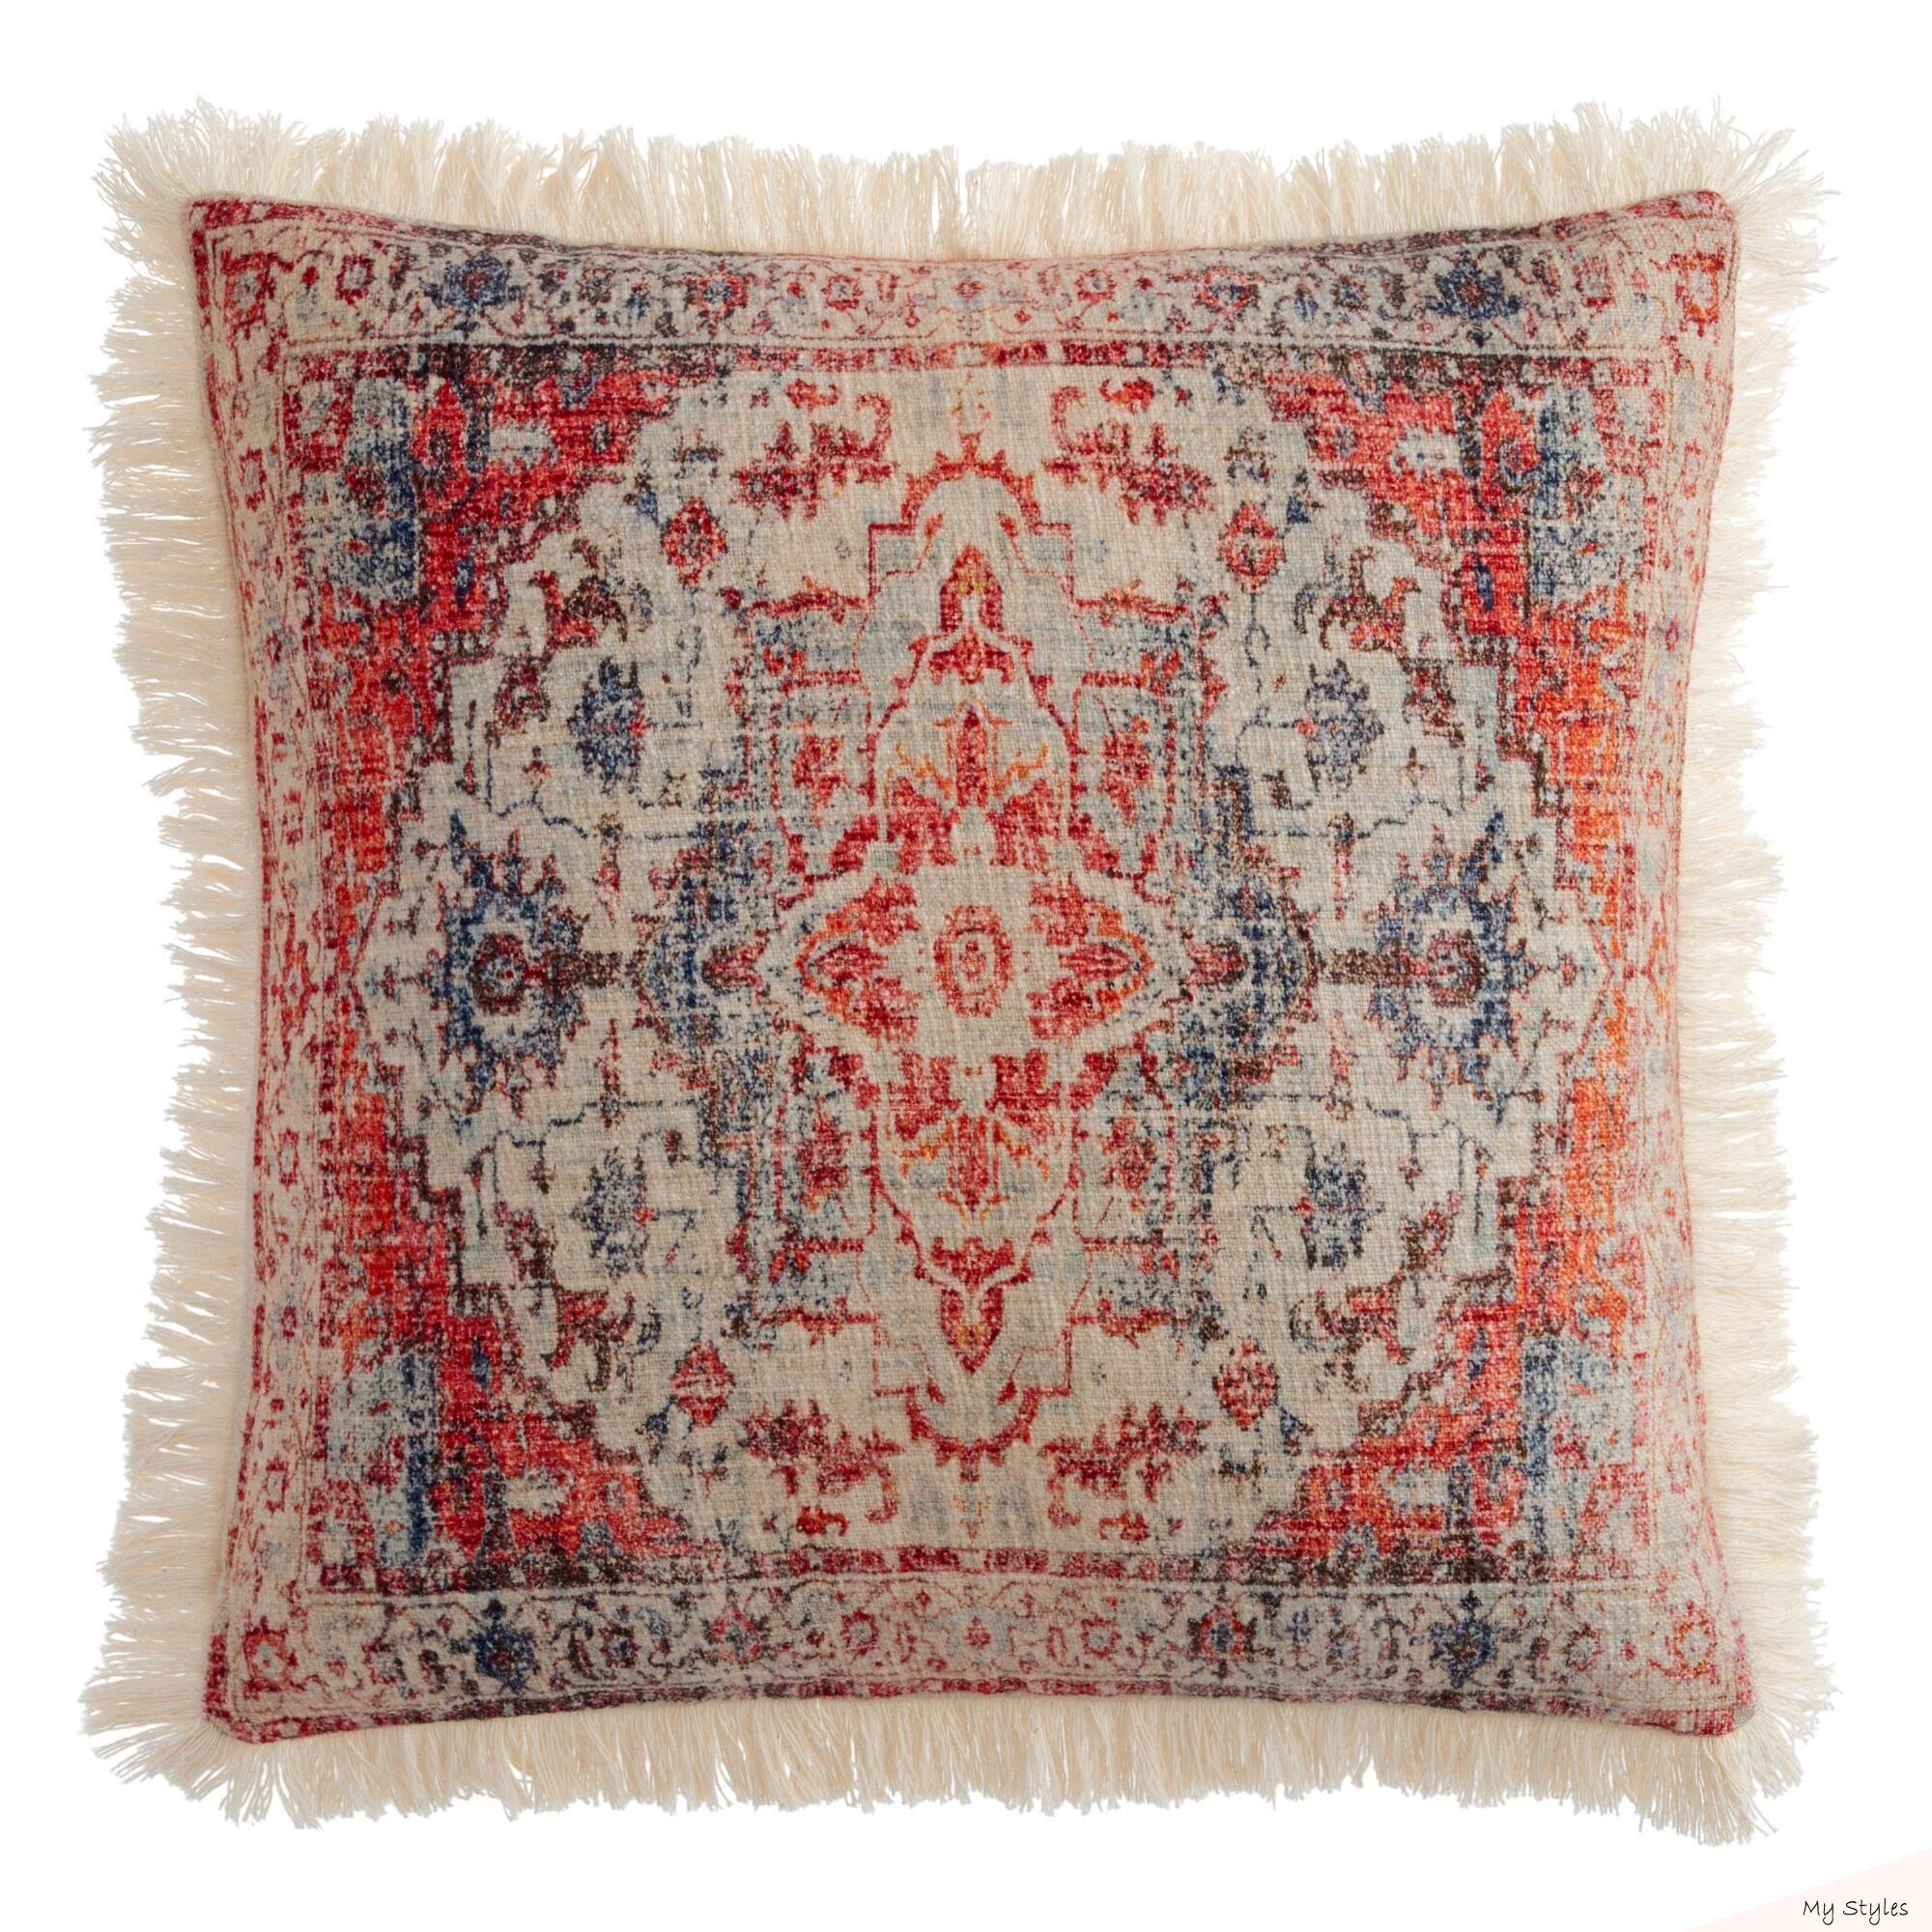 runner rug oushak rug turkish rug vintage rug carpets rug traditional rug living room rug oriental rug 3 3 feet x 8 3 feet vintage throw pillows vintage rugs printed throw pillows